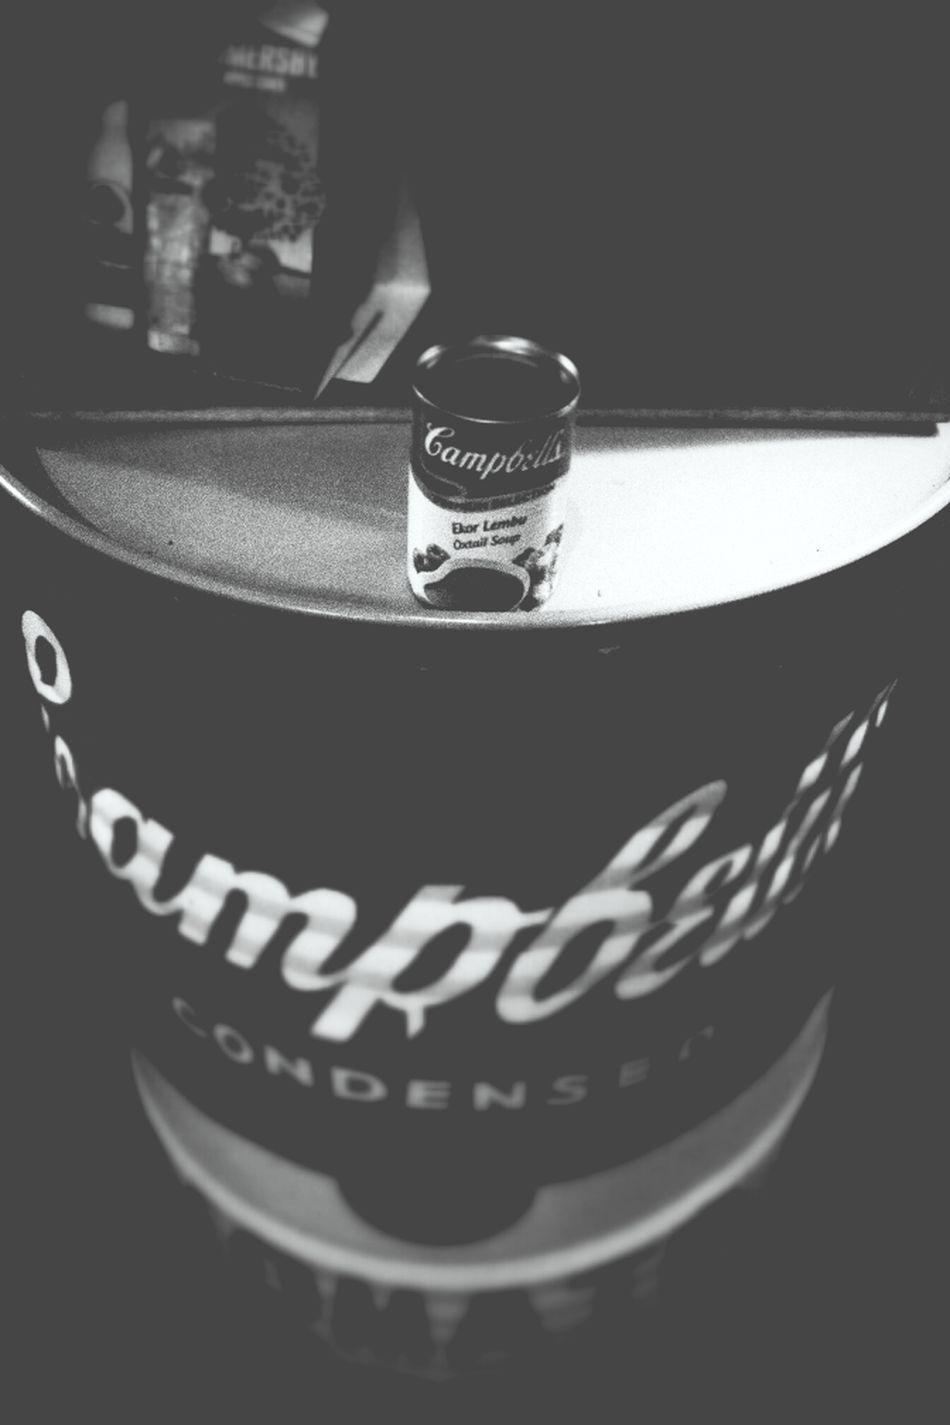 Campbell Soup Sr & Jr